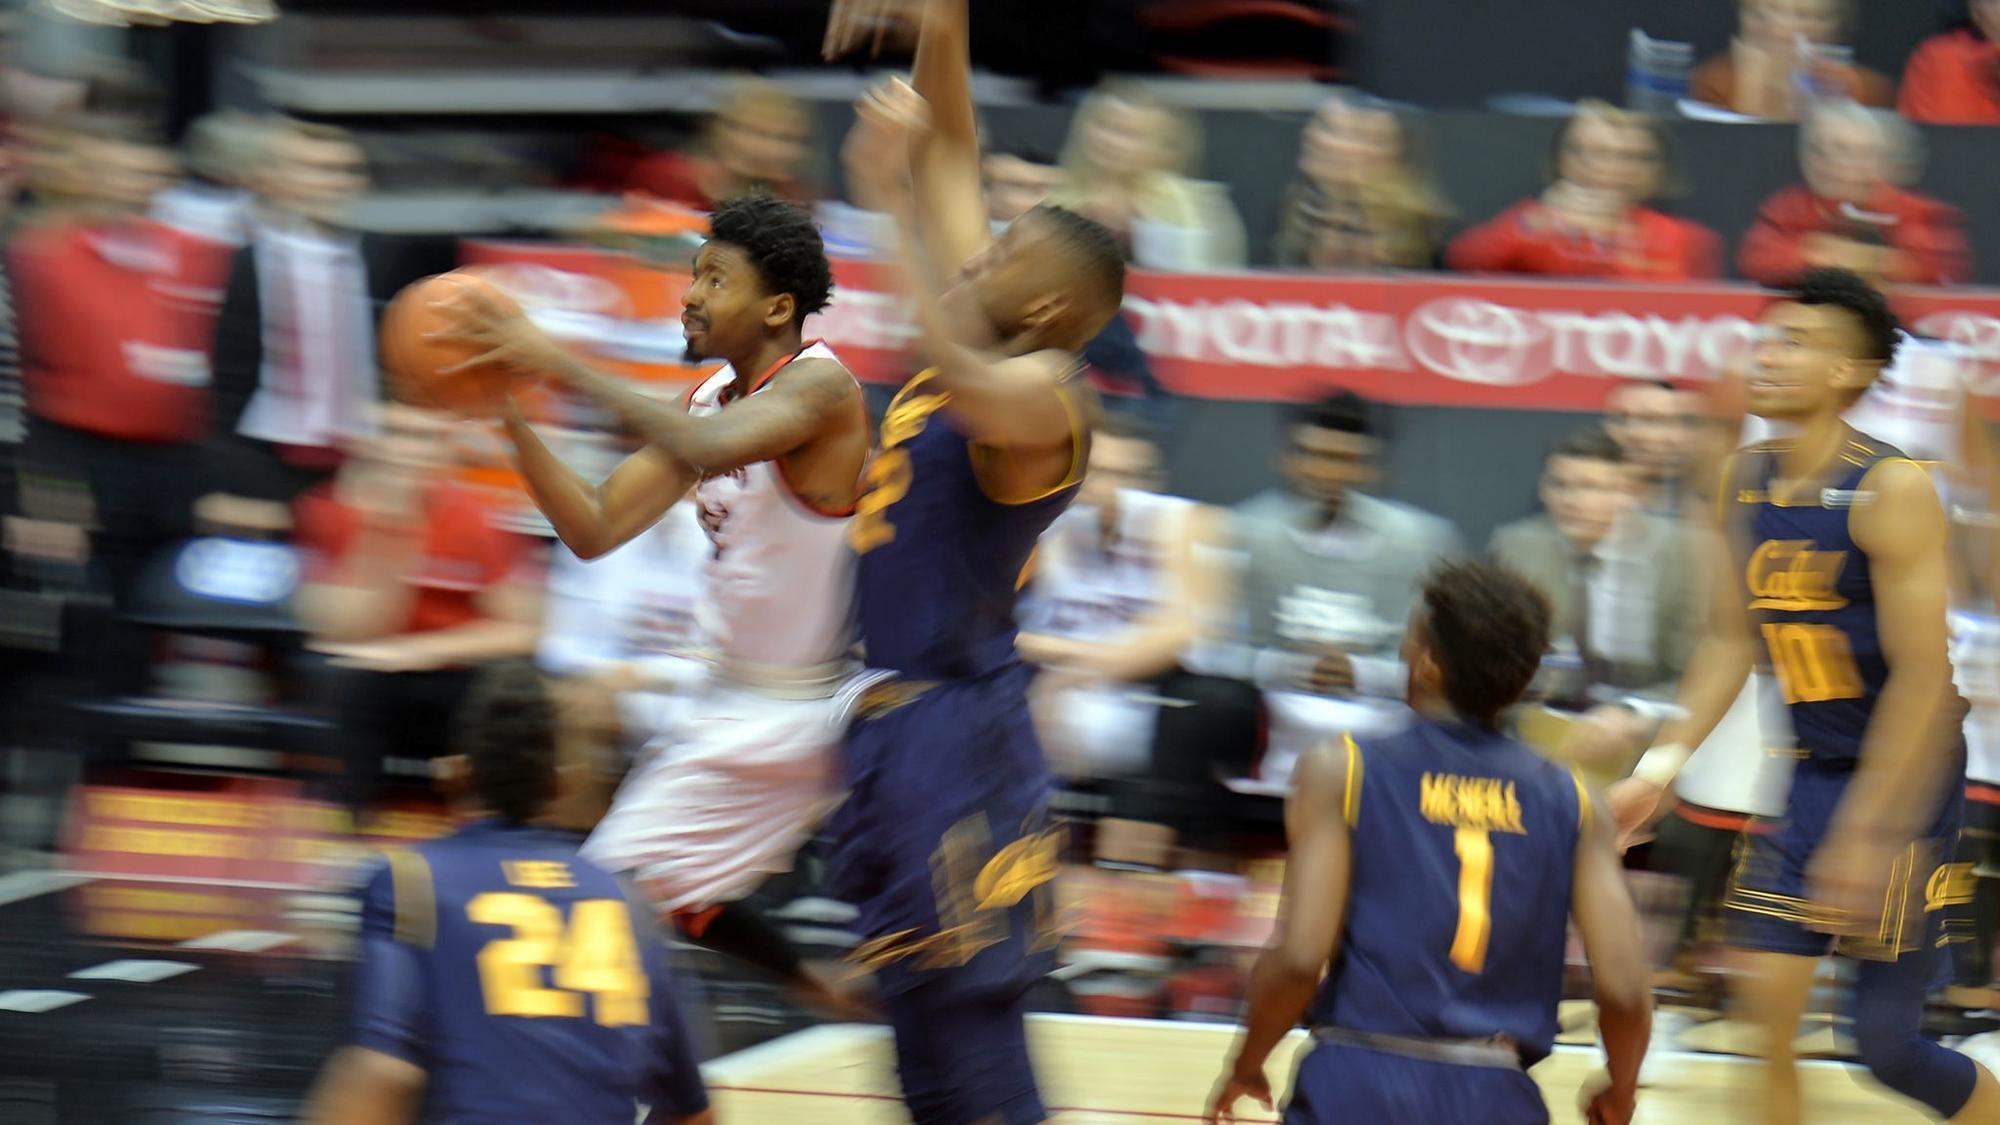 Sd-sp-sdsu-basketball-cal-bears-20181207